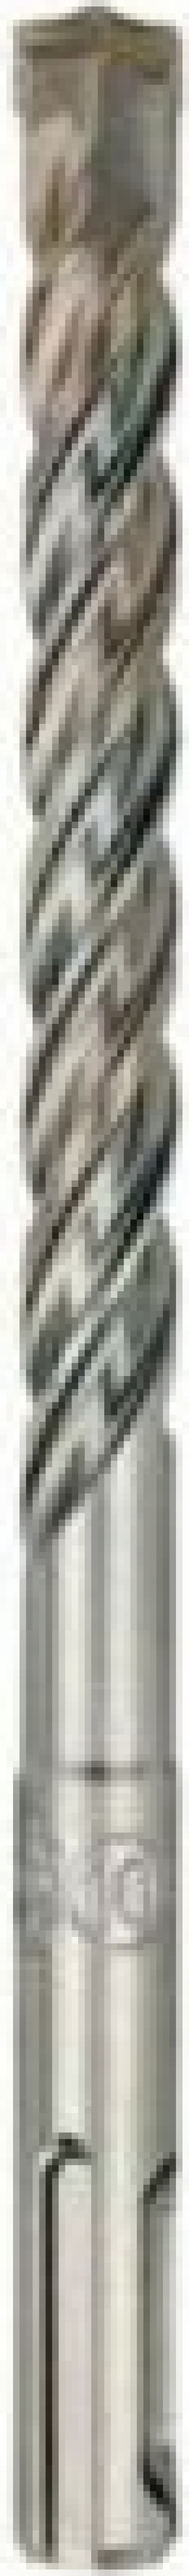 Burghiu SDS-plus EXTREME 2 18 x 950 x1000 Dewalt Accesorii masini de gaurit